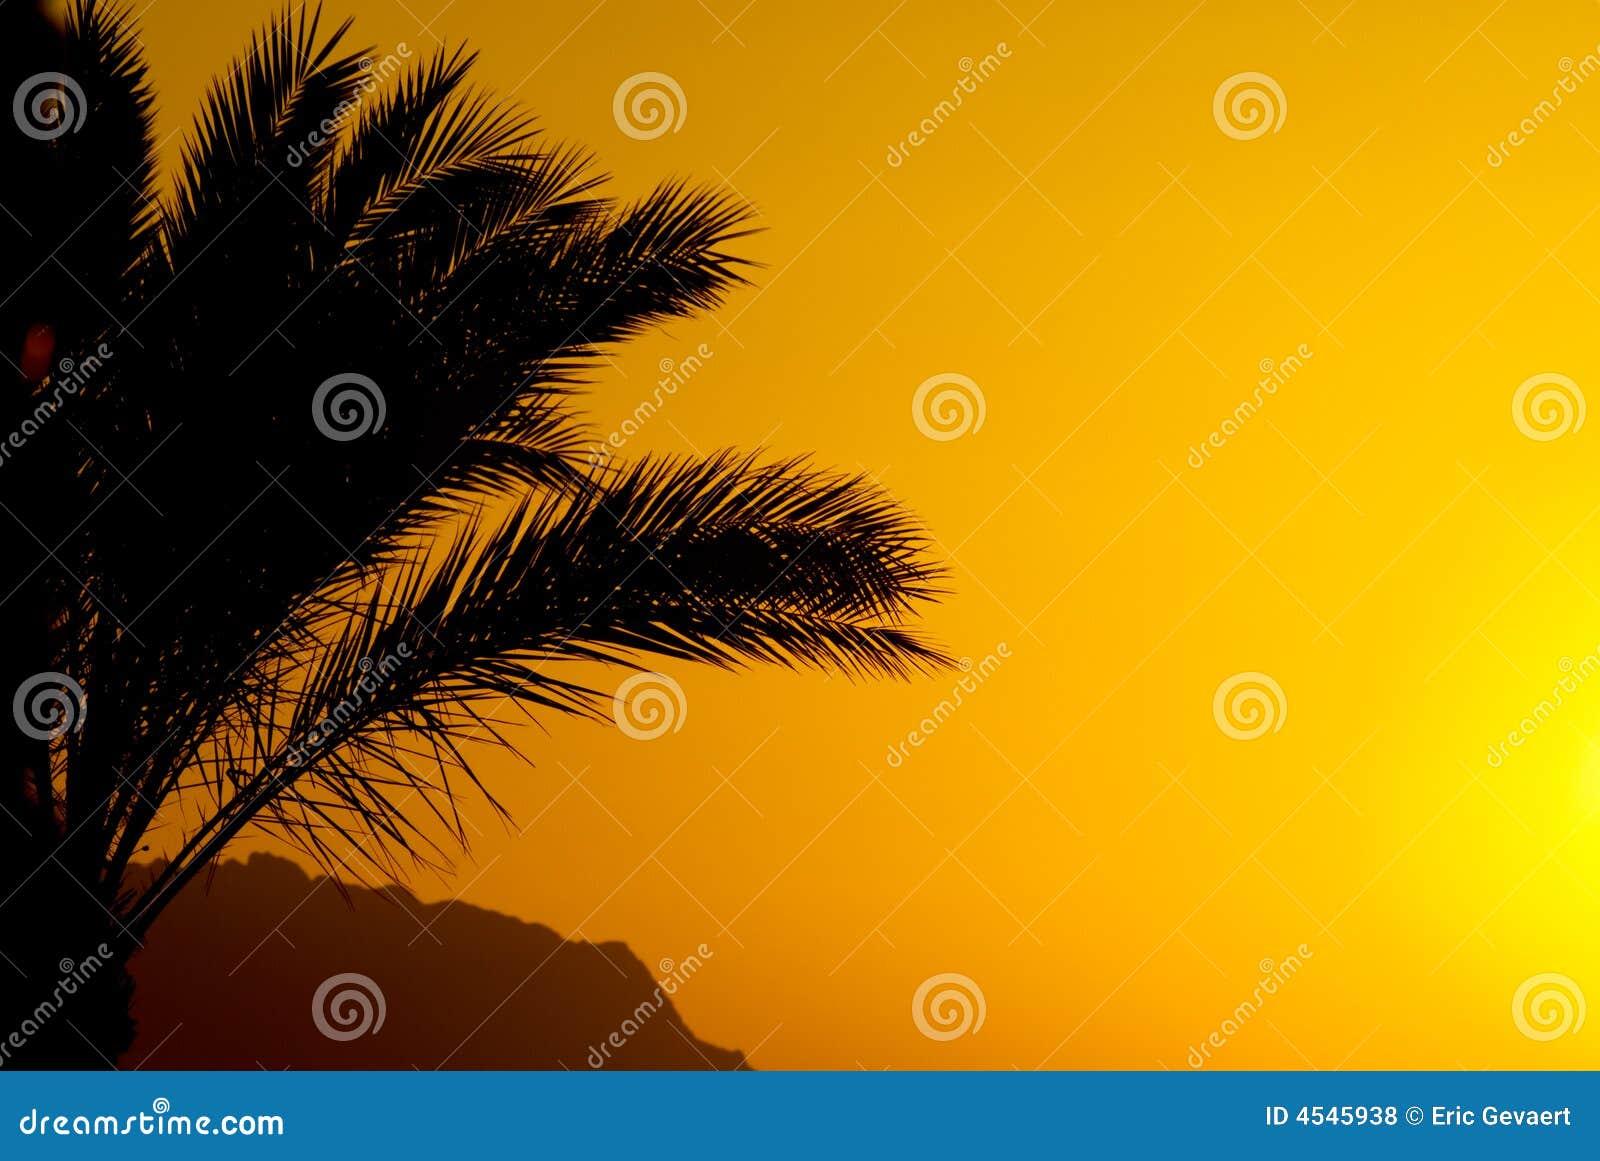 Palmtree und Sonnenuntergang